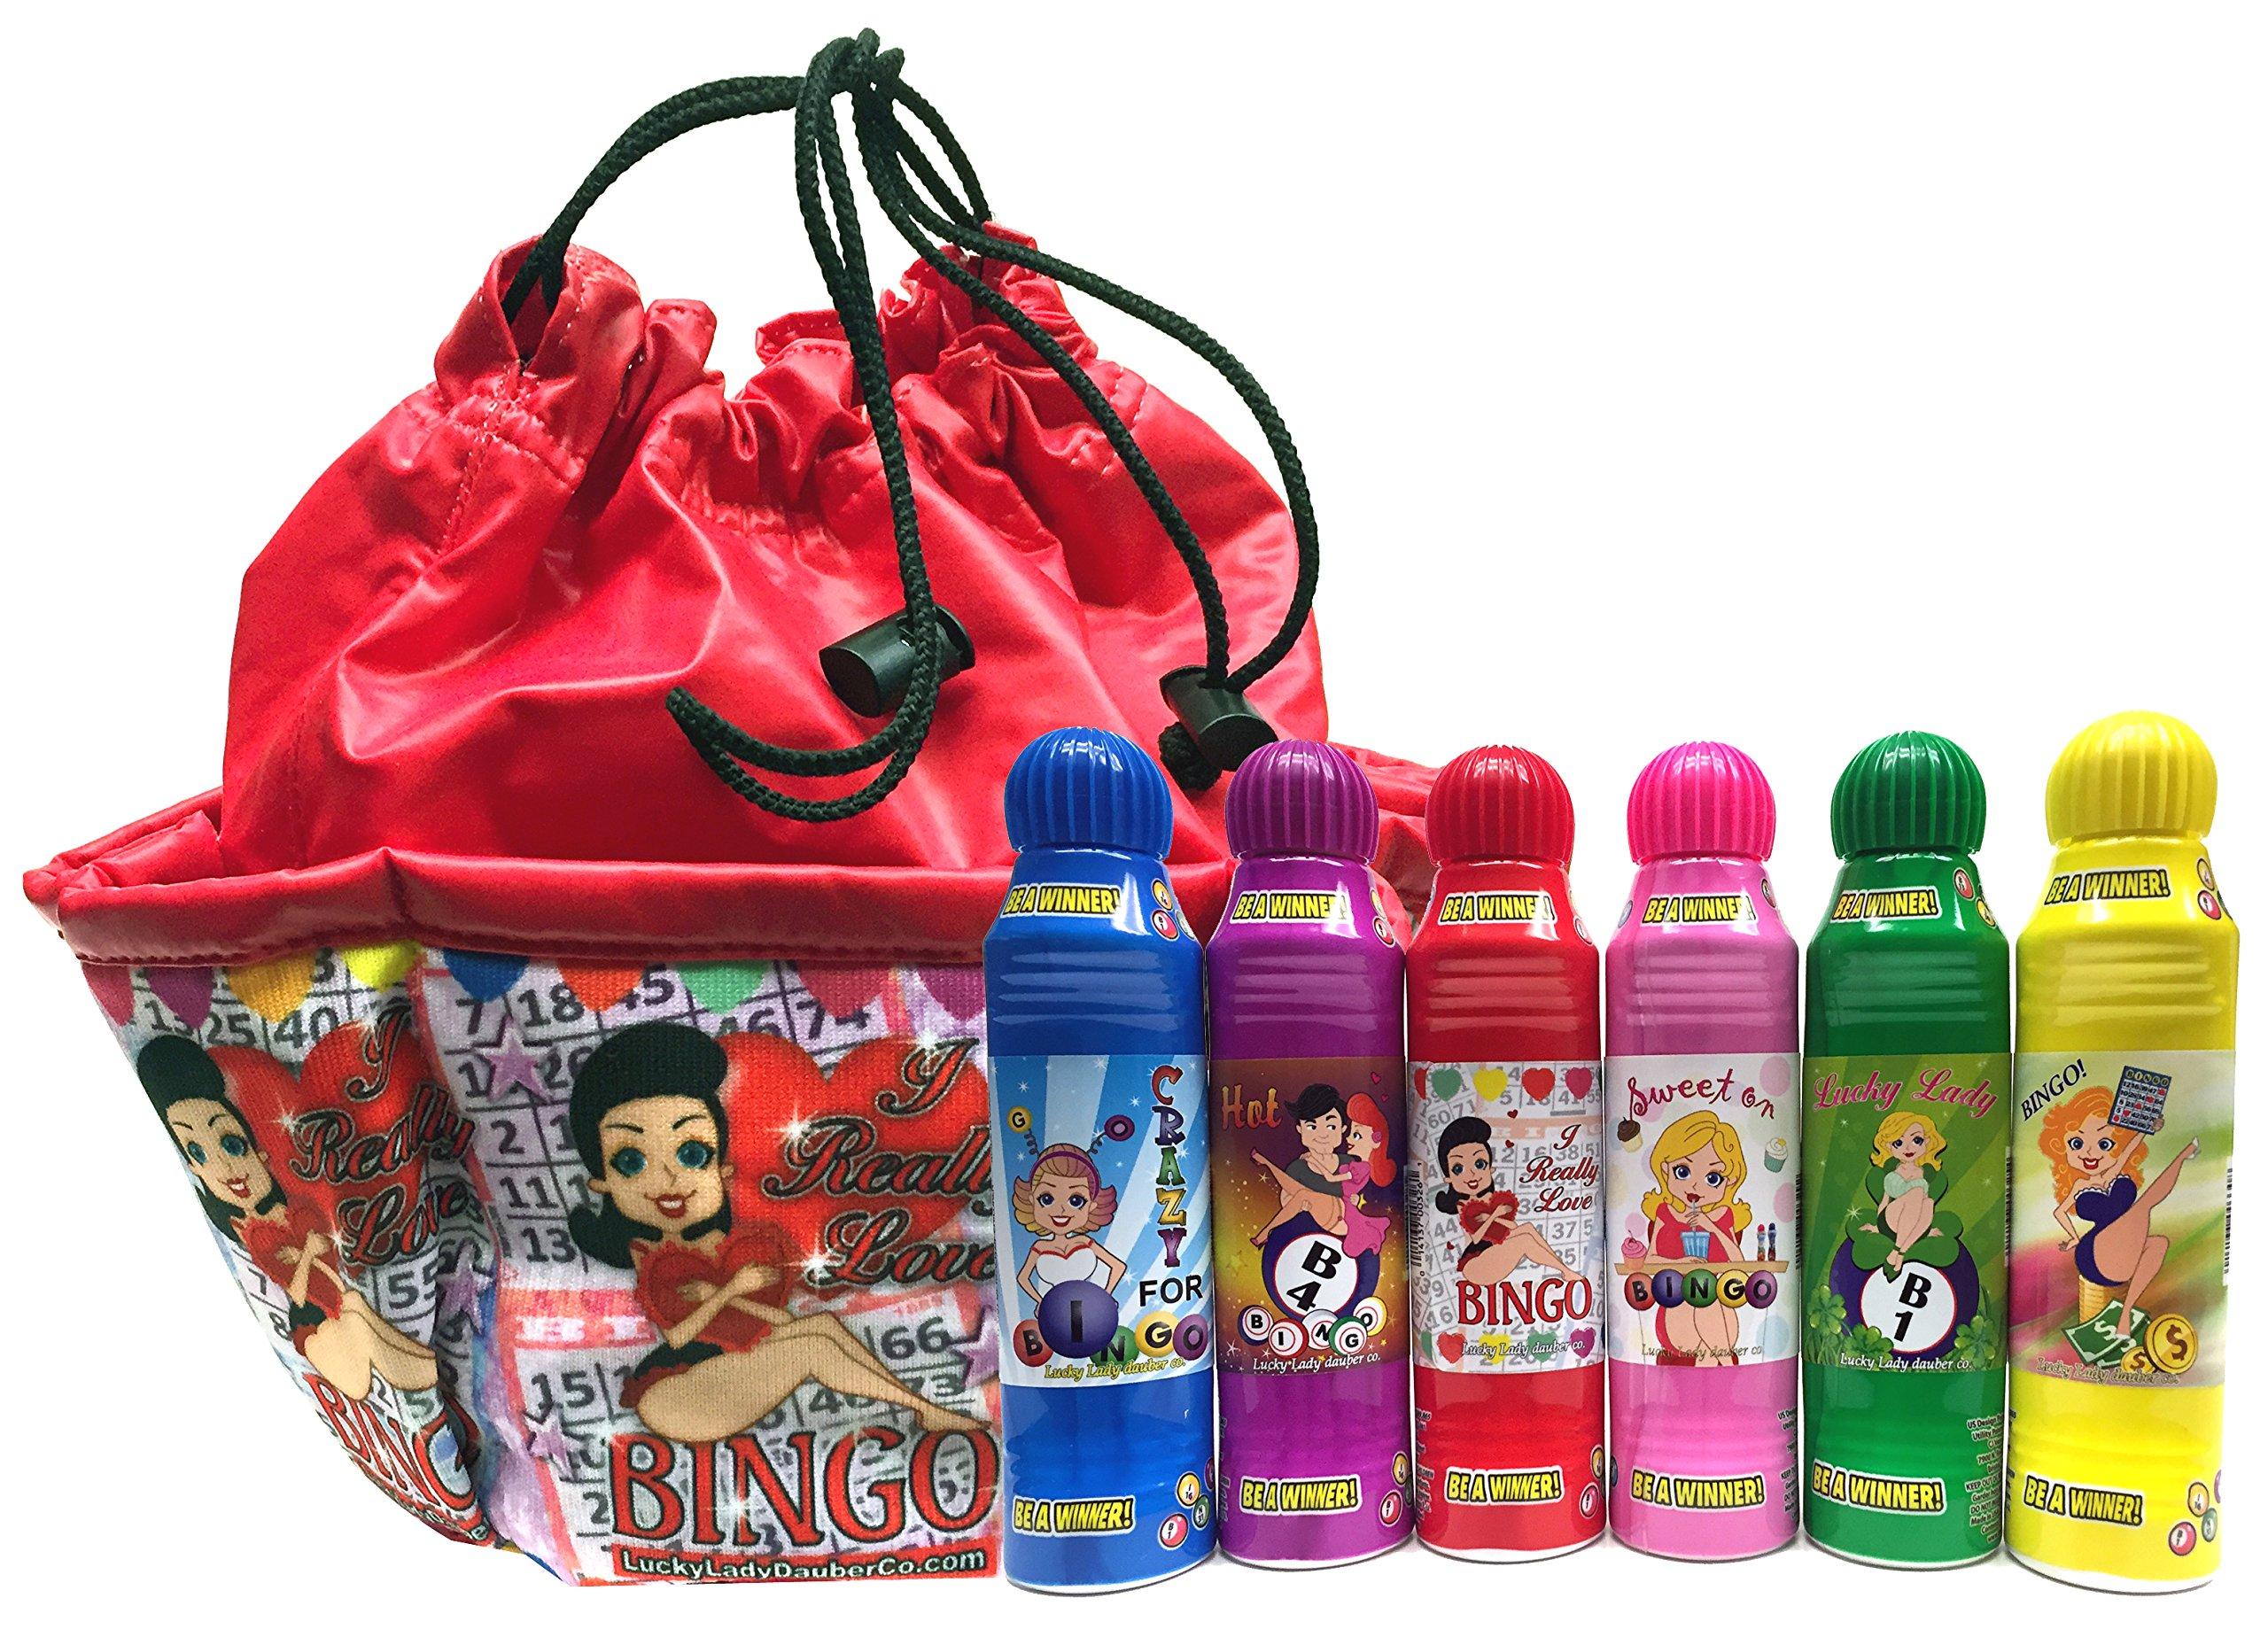 Lucky Lady Bingo Daubers 6-Pack with ''I Really Love Bingo'' Bag!